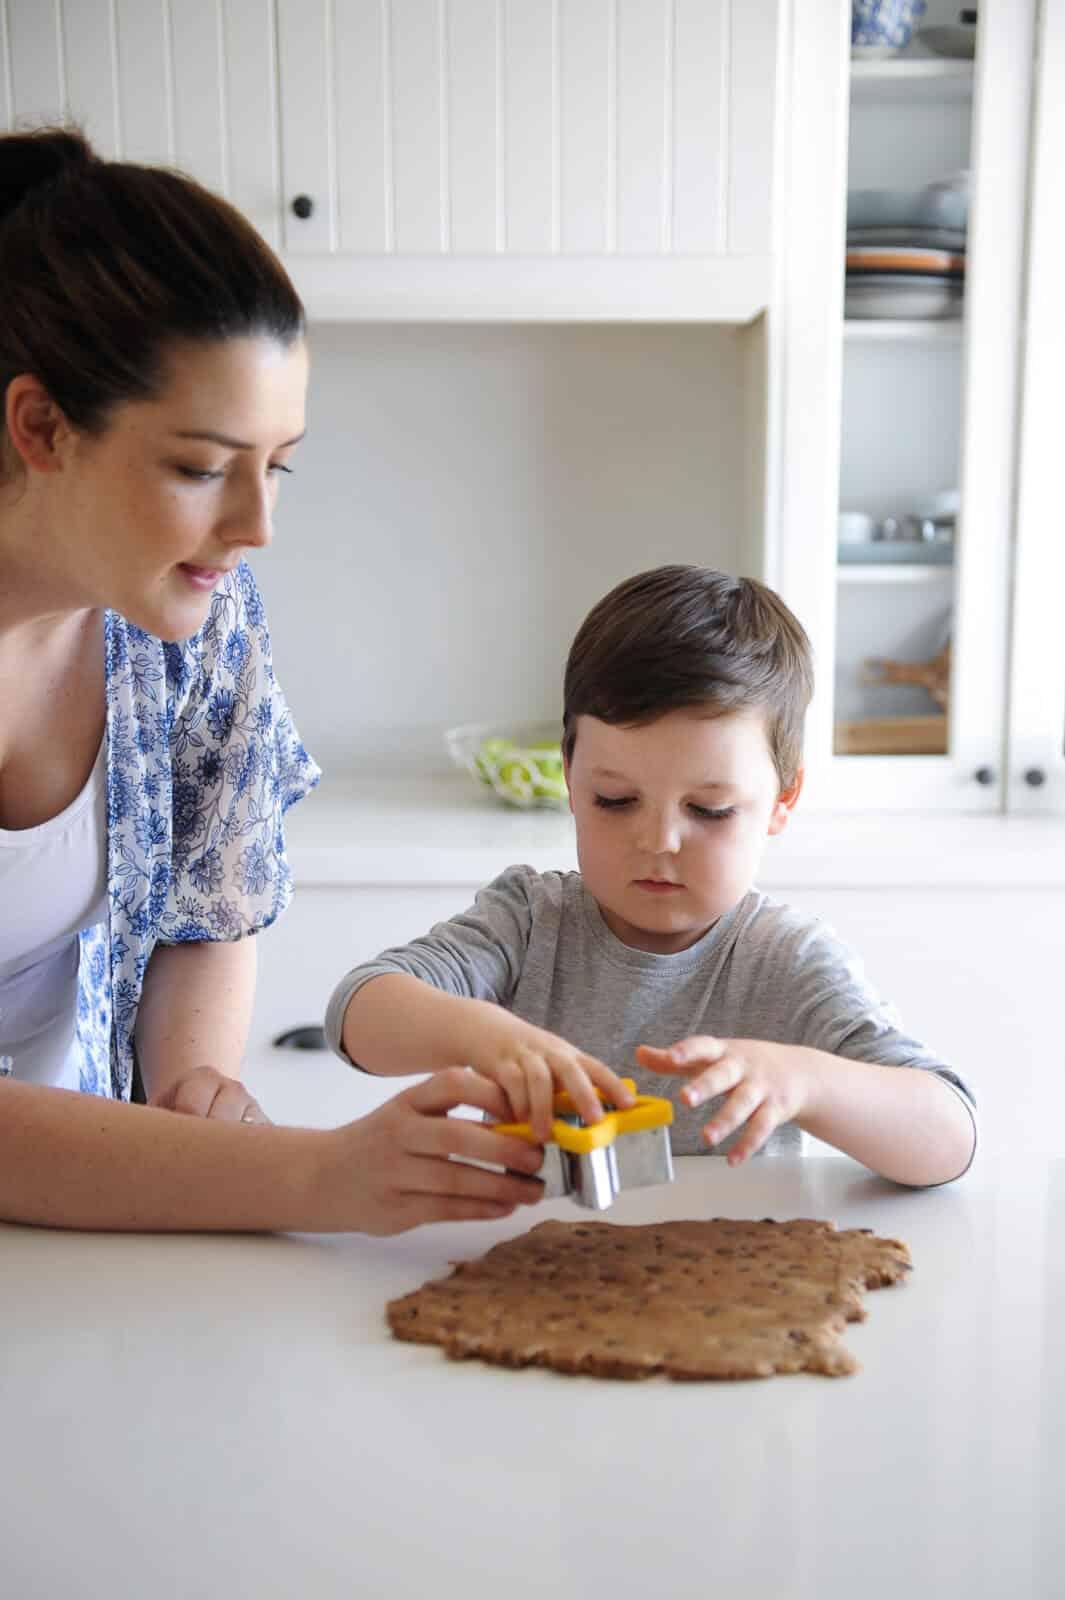 A young boy cutting cookie dough